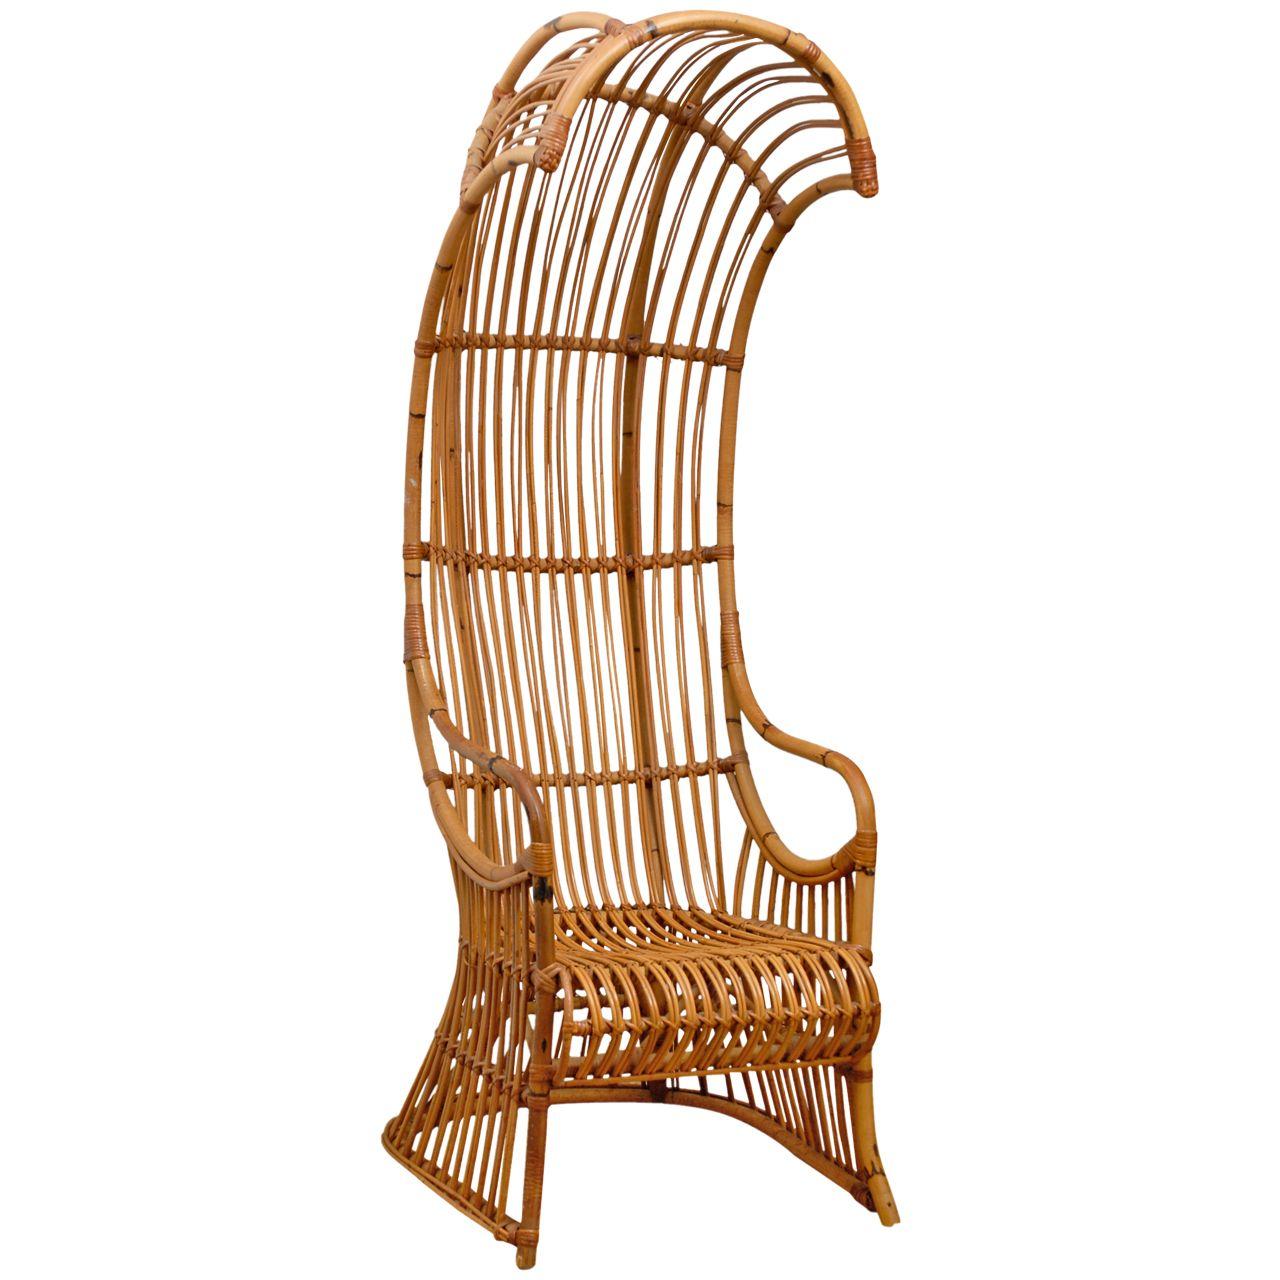 1stdibs.com | Rattan Hooded Chair